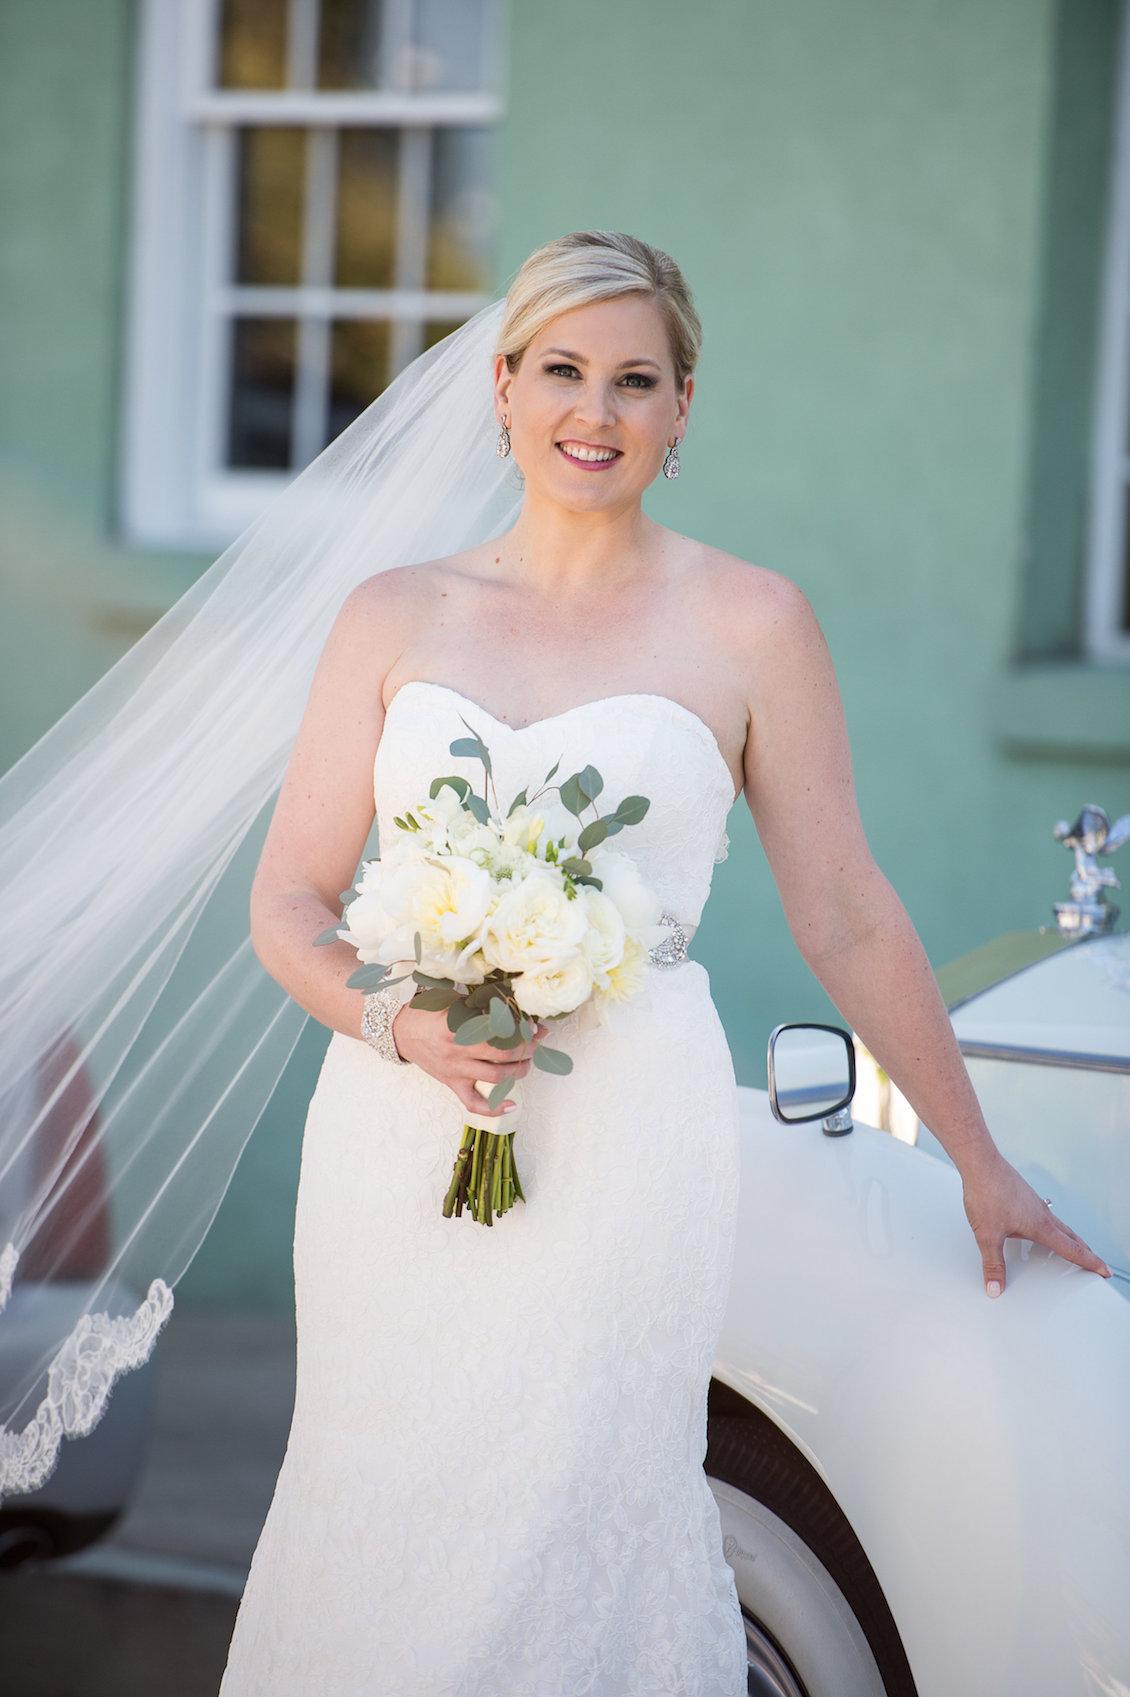 Elegant Summer Wedding in Florida - Bridal Portrait / Séverine Photography